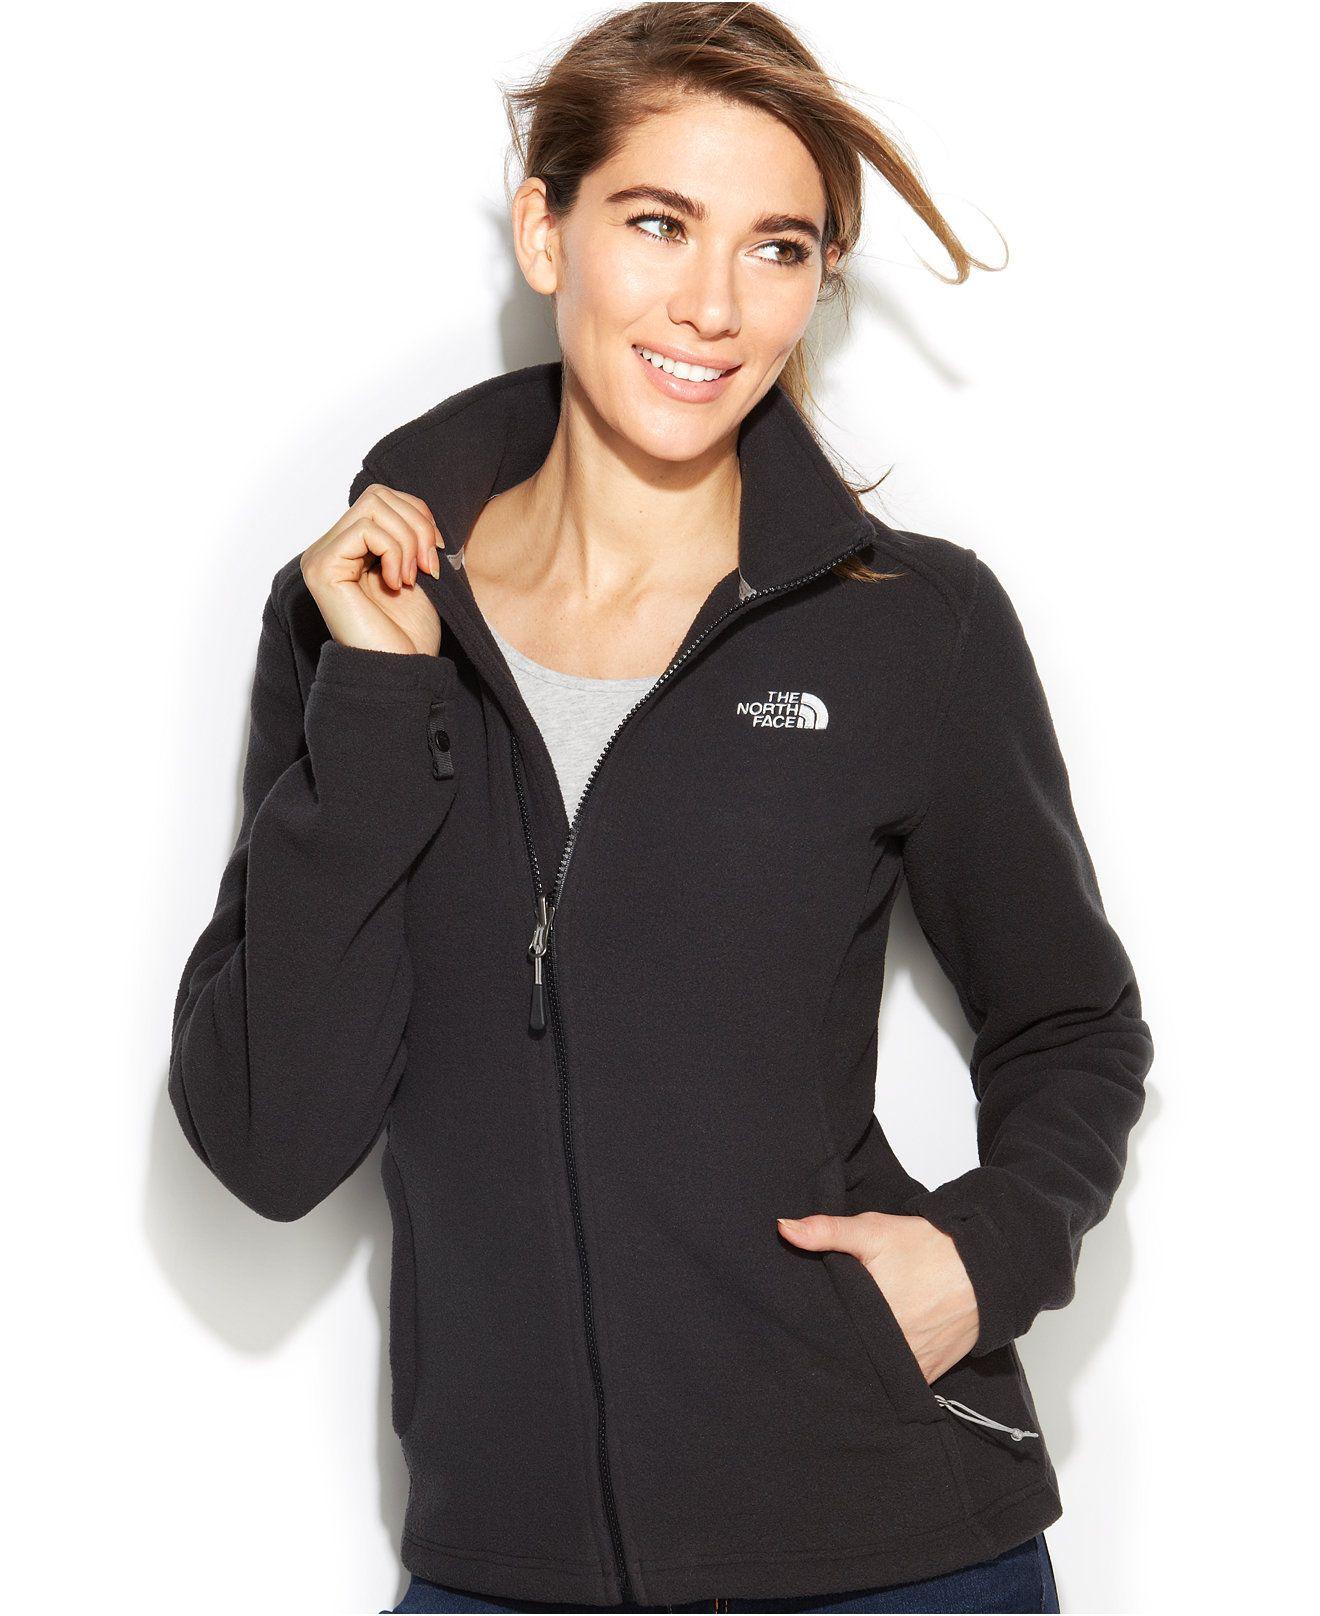 The North Face Khumbu Fleece Jacket Jackets Blazers Women Macy S Blazer Jackets For Women Fleece Jacket North Face Outfits [ 1616 x 1320 Pixel ]